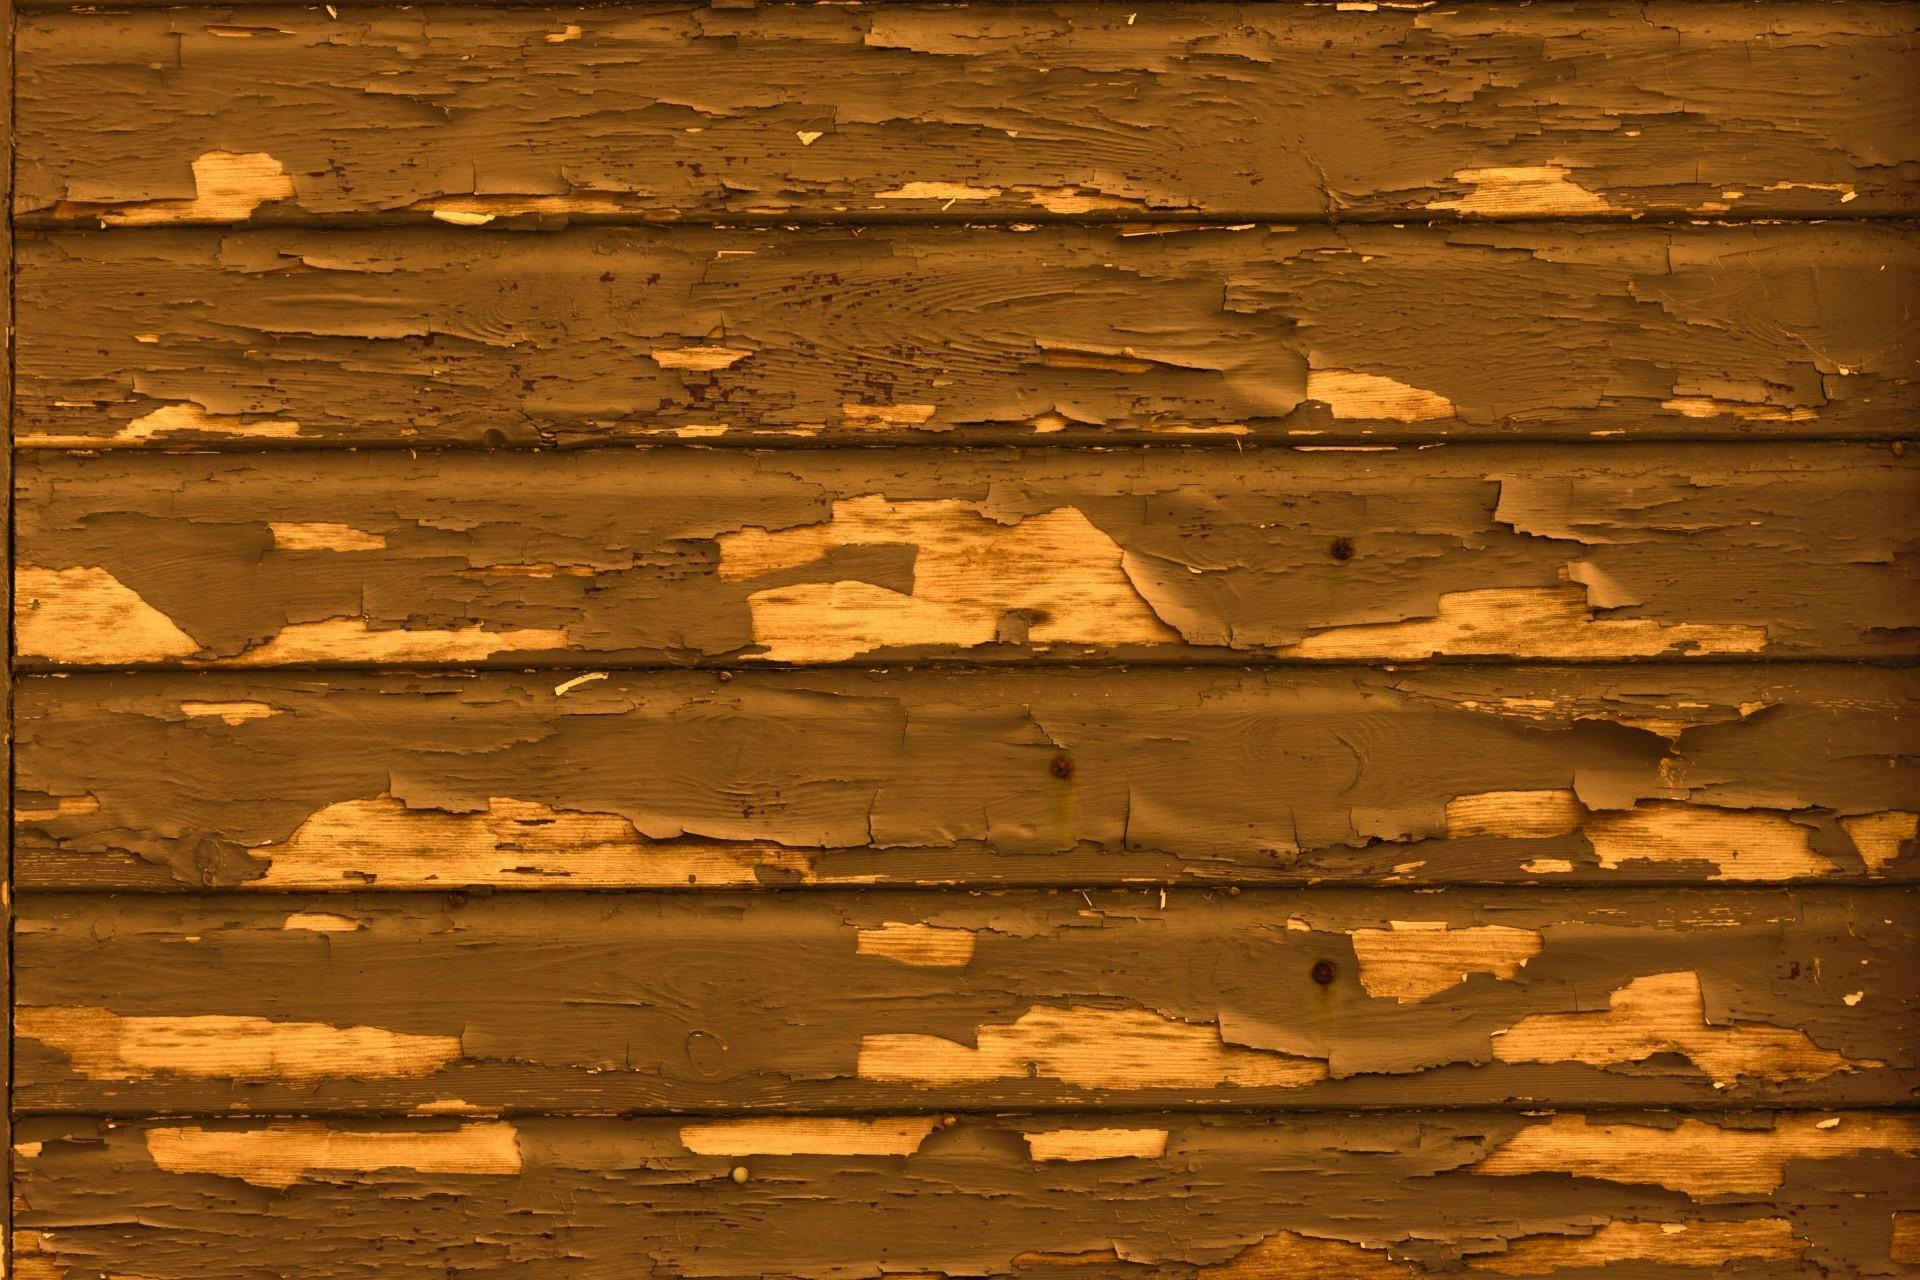 rock light abstract wood sunset sunlight texture floor old wall golden  reflection brown soil paint yellow